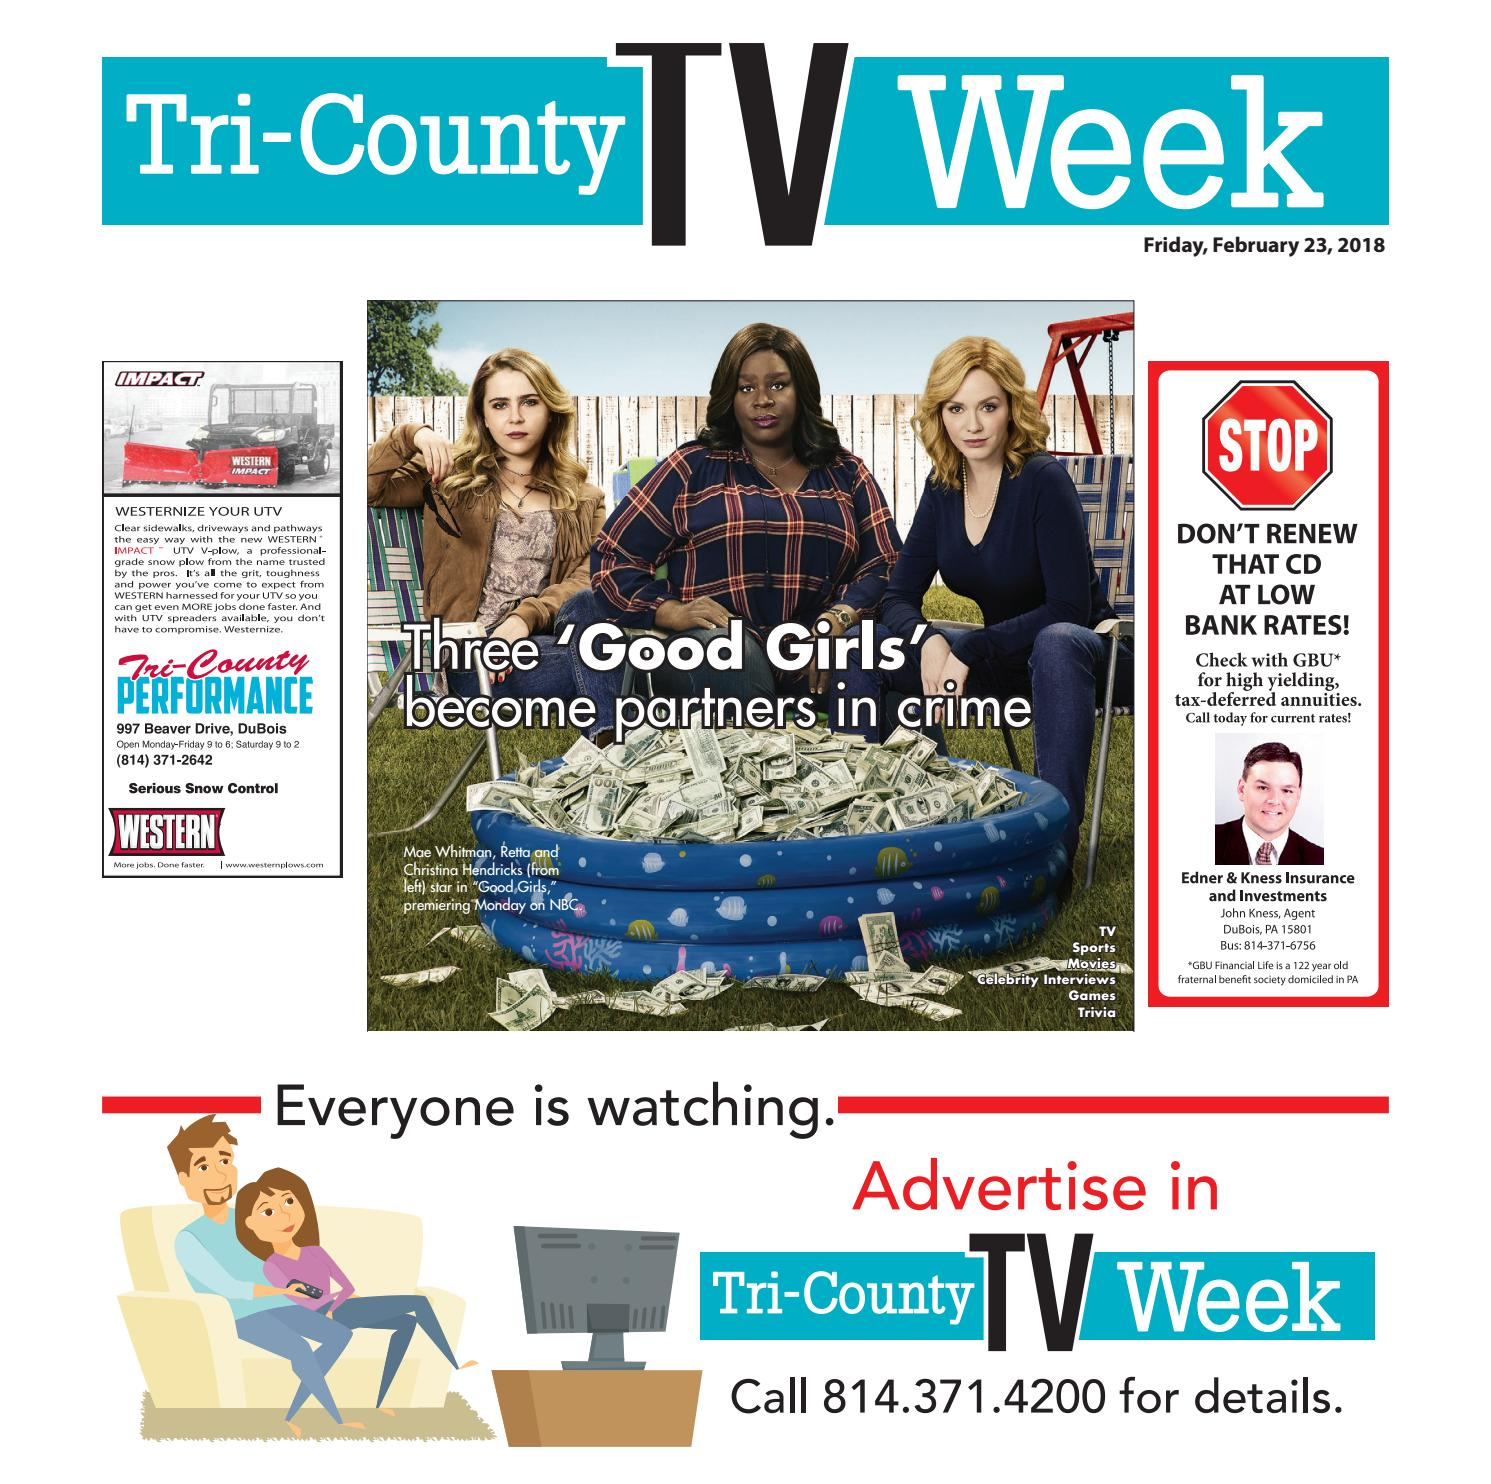 290de3993f23c3 TV WEEK 02 23 2018 by Tri-County TV Week - issuu